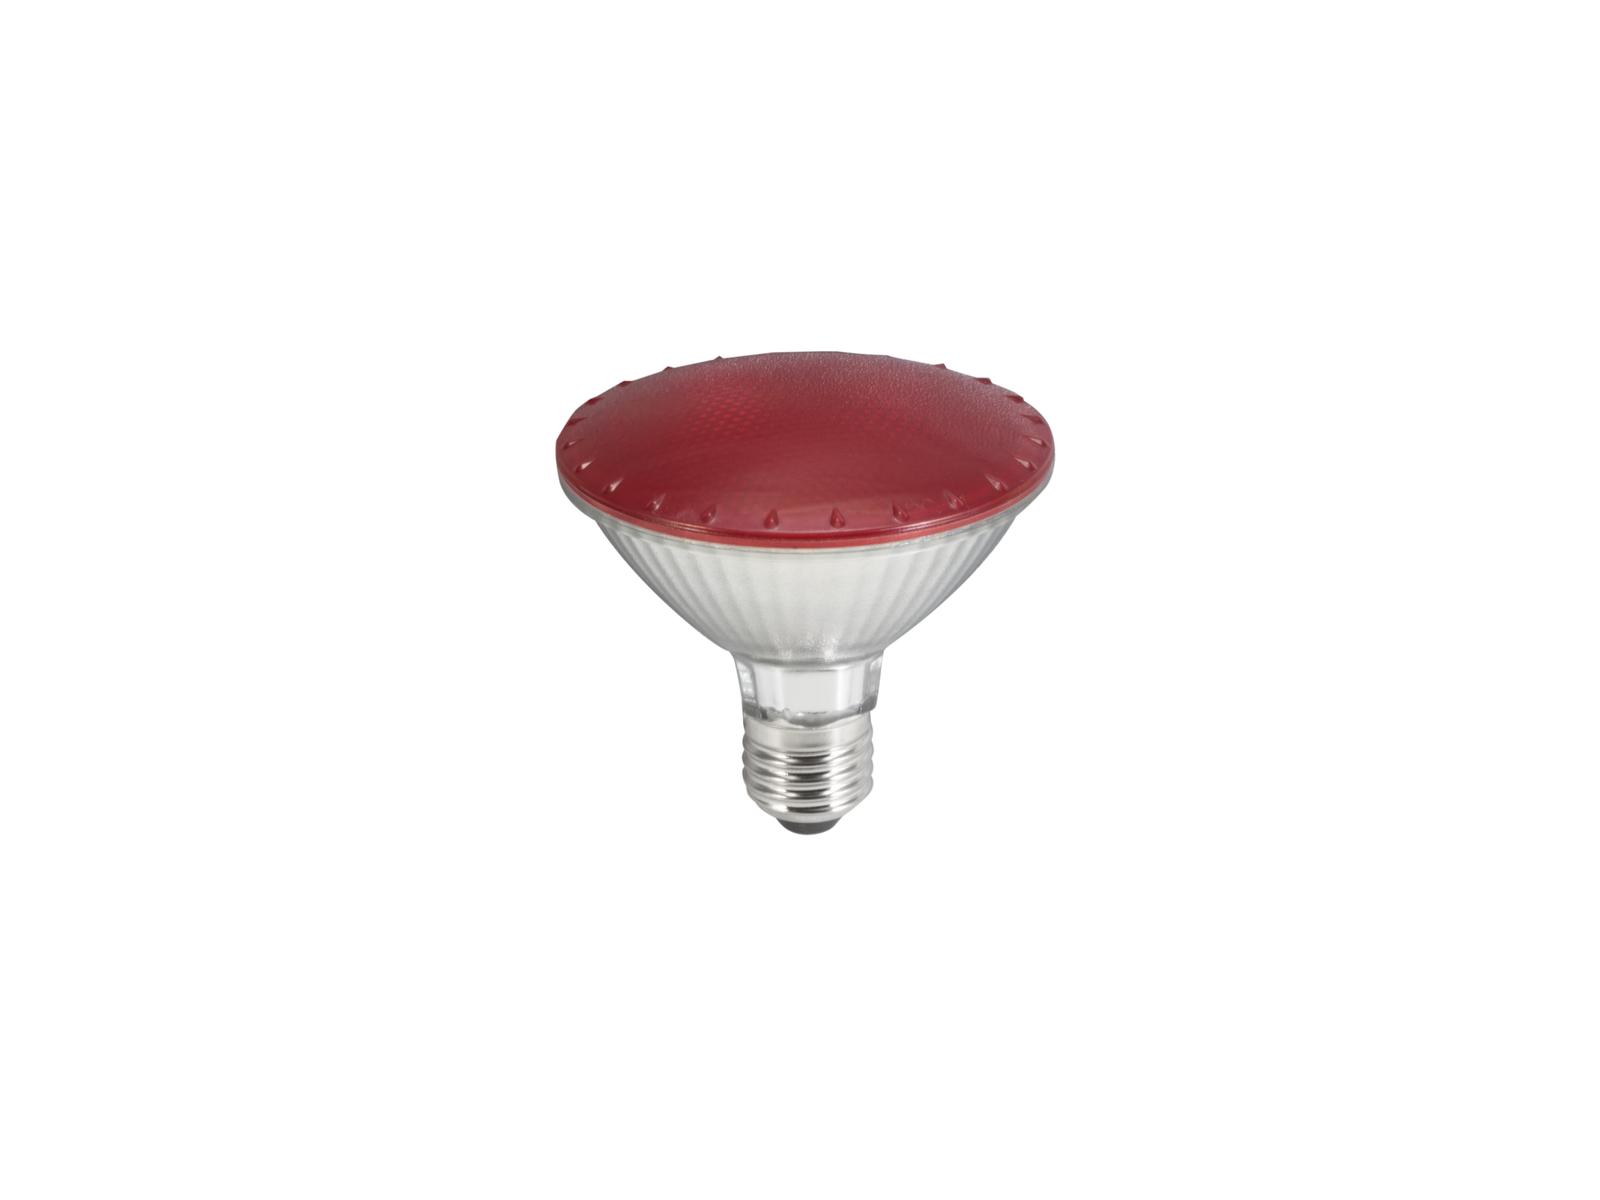 OMNILUX PAR-30 230V SMD 11W E-27 LED rot